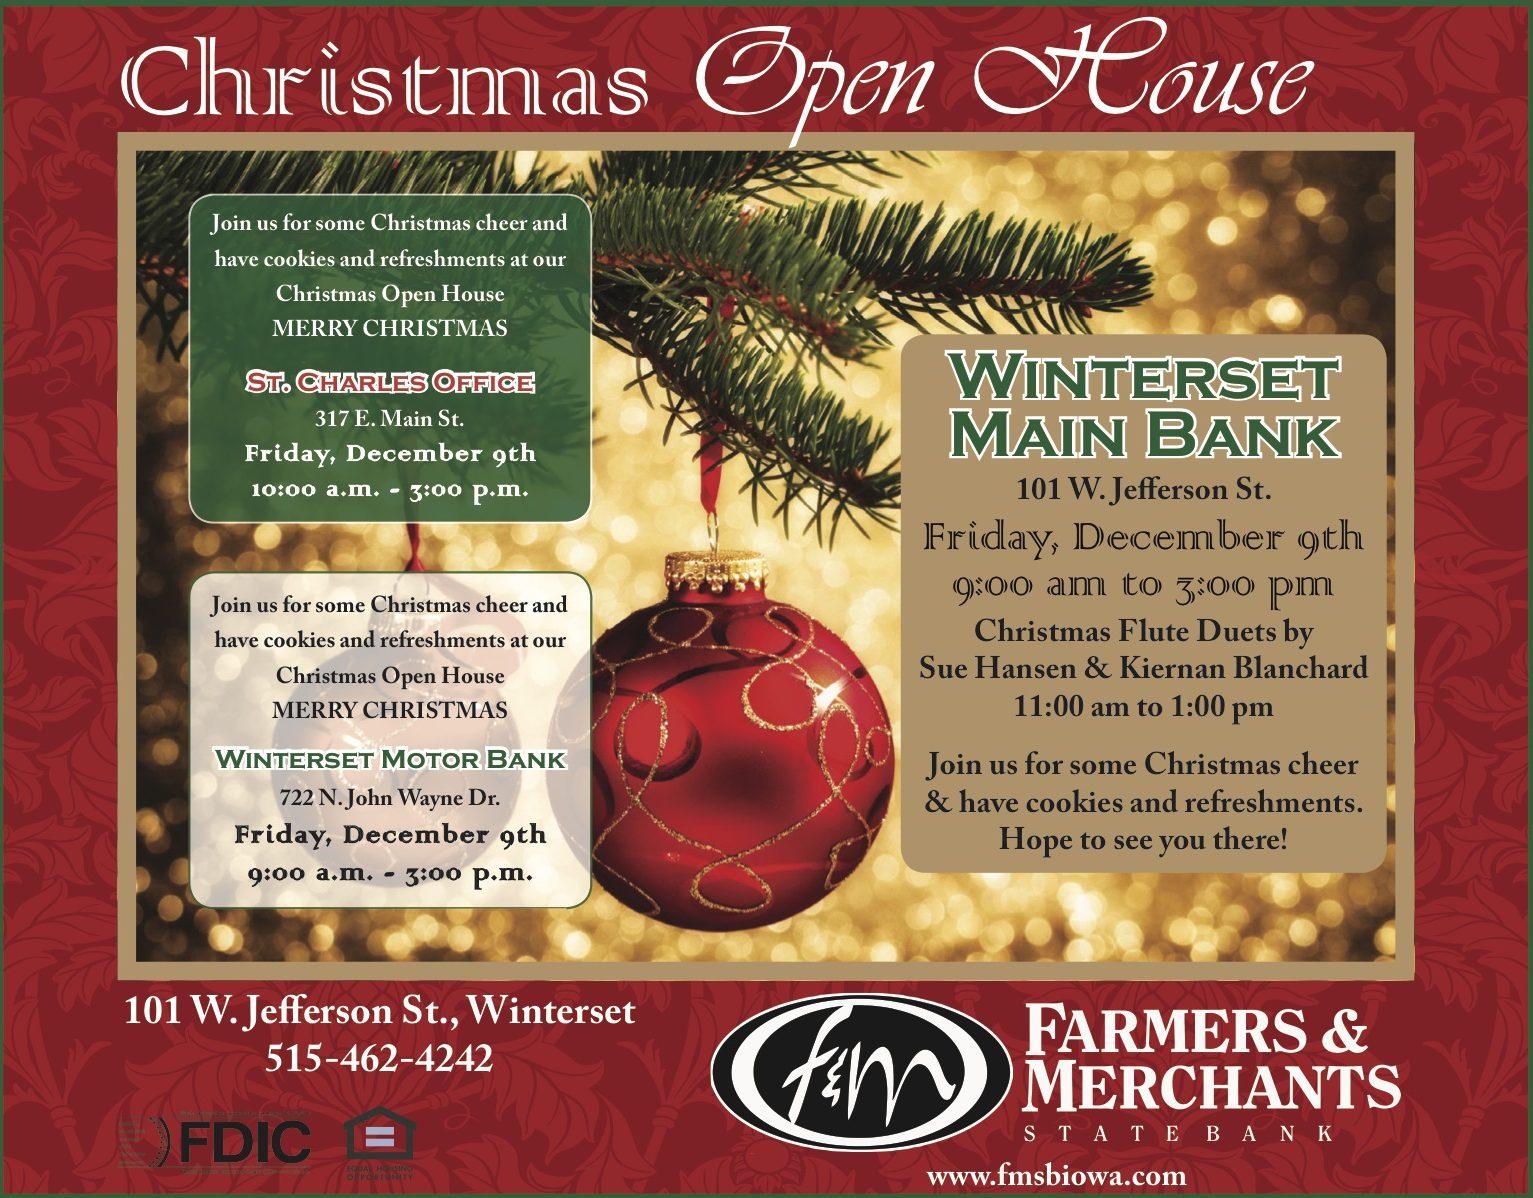 FM_ChristmasOpenHouse